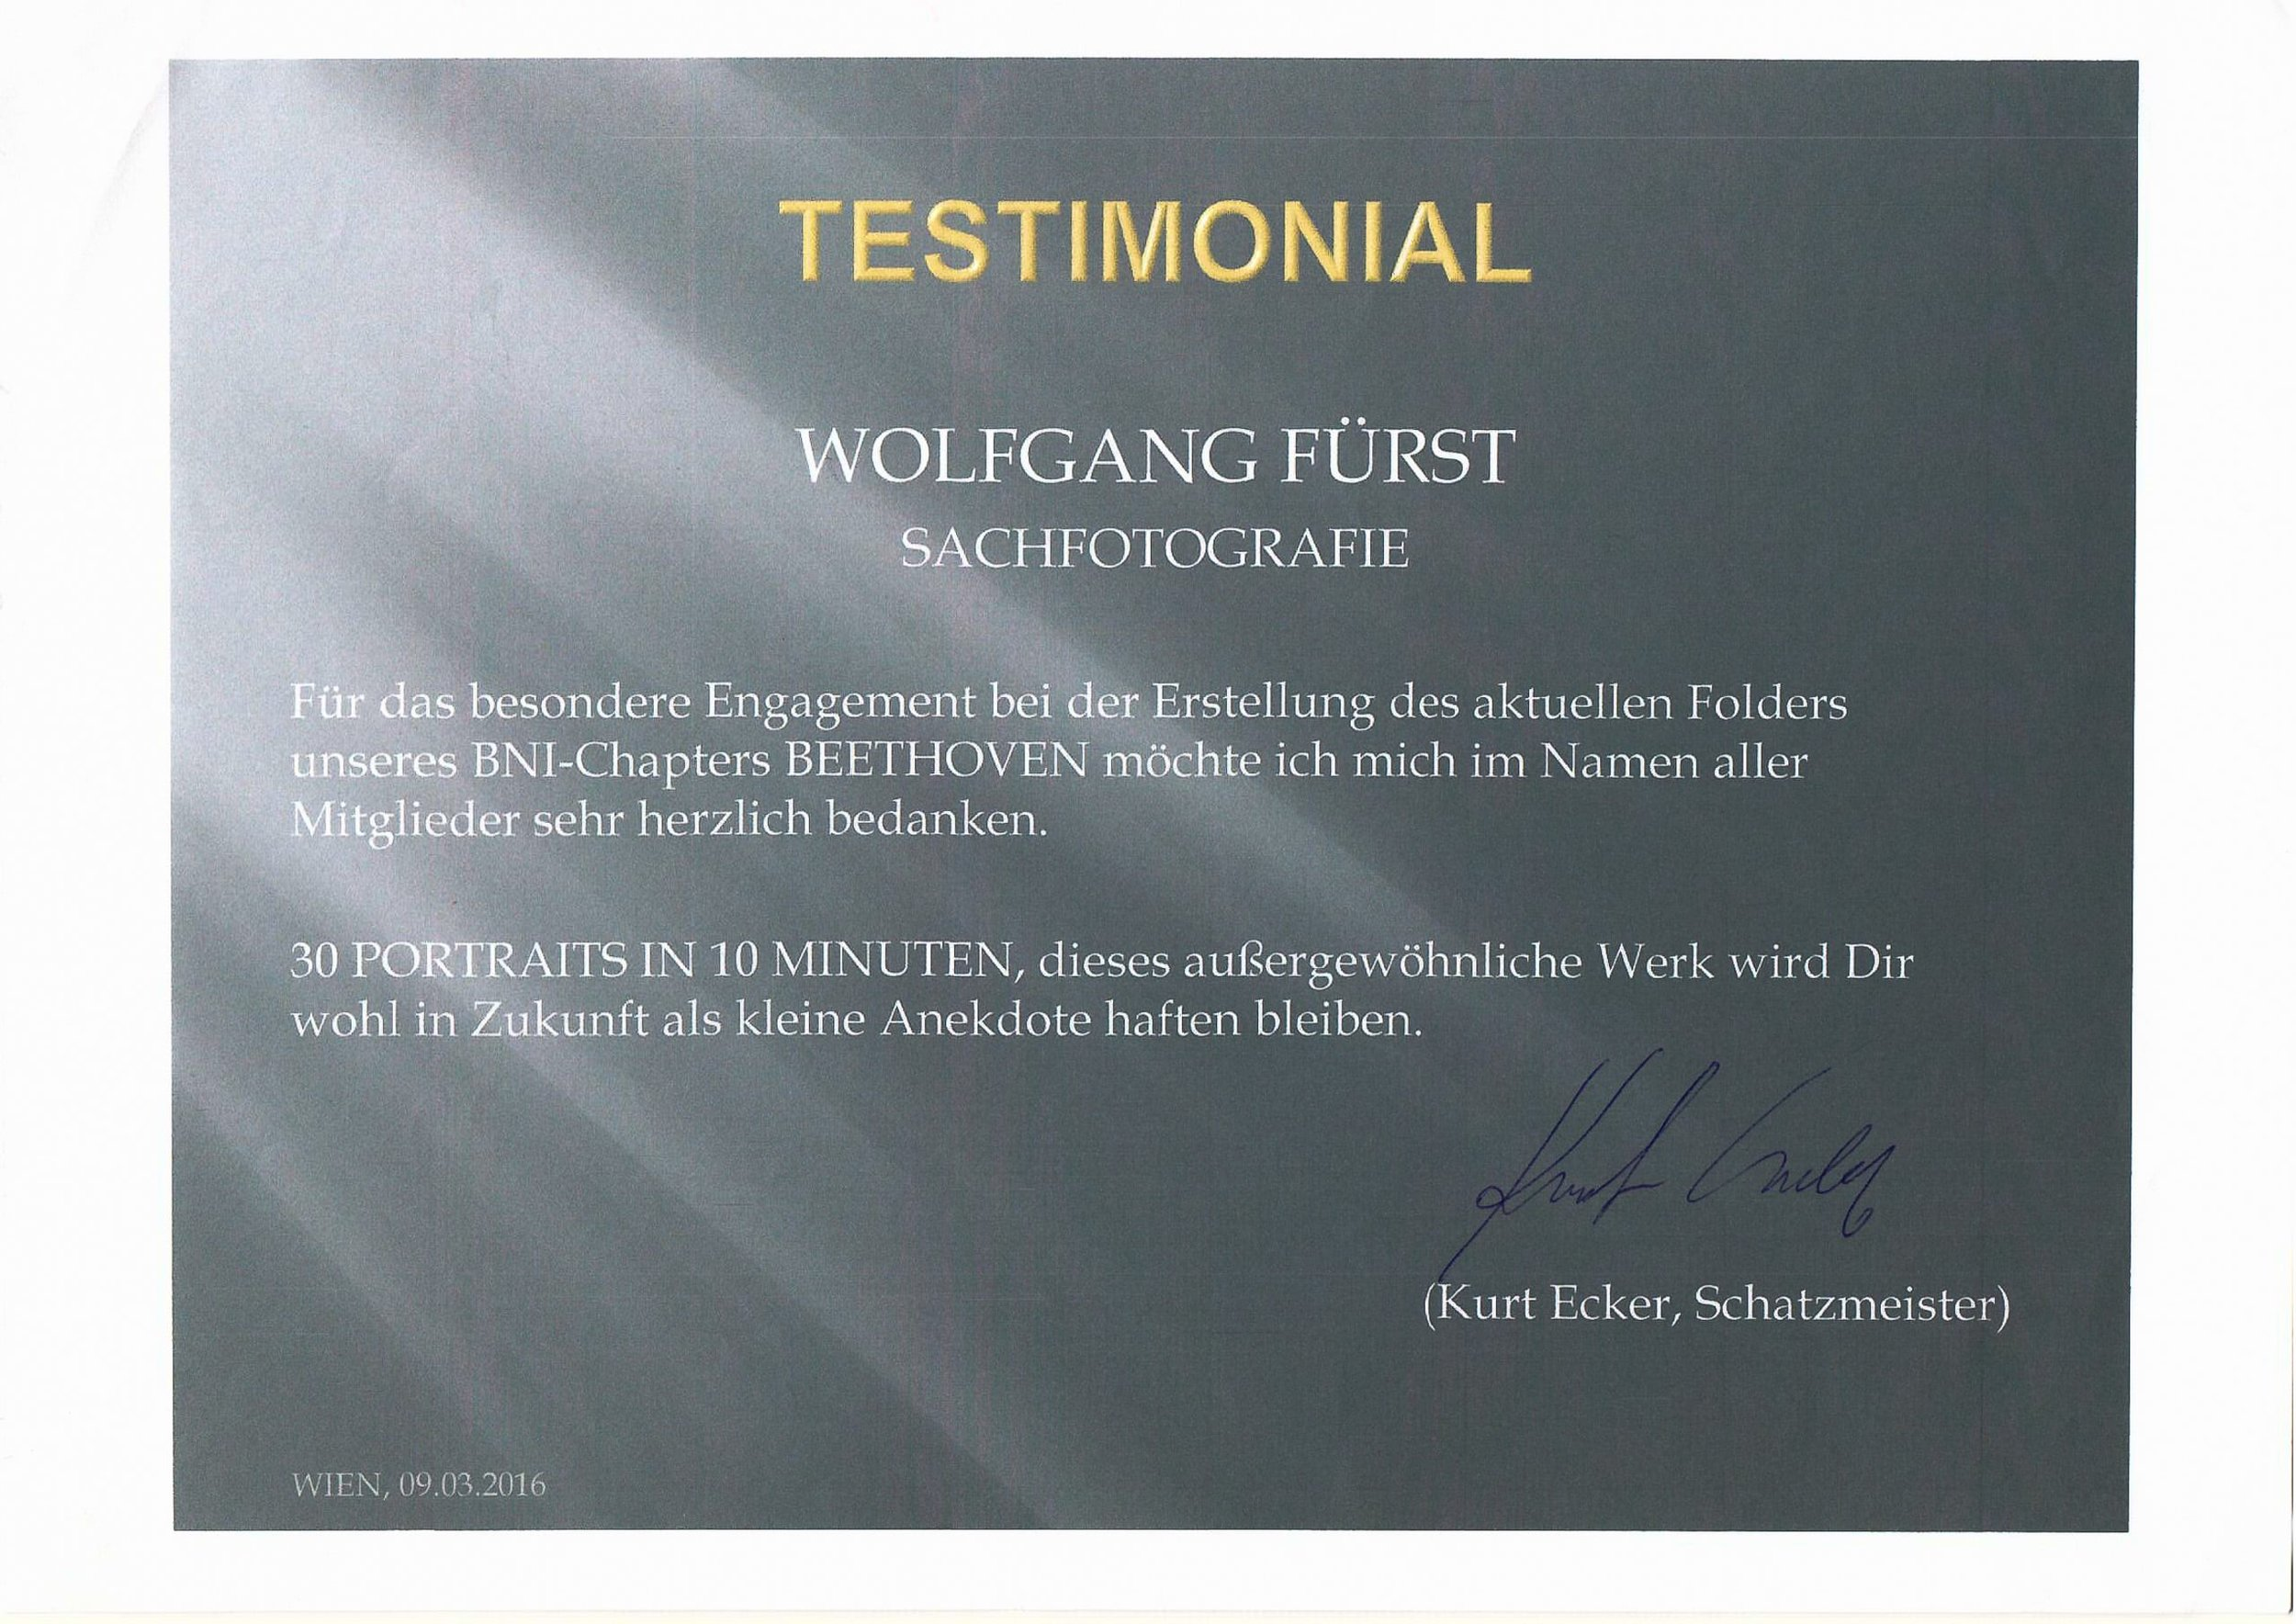 SF_PF_Testimonial_Scan_ 1.jpeg_crw.jpg